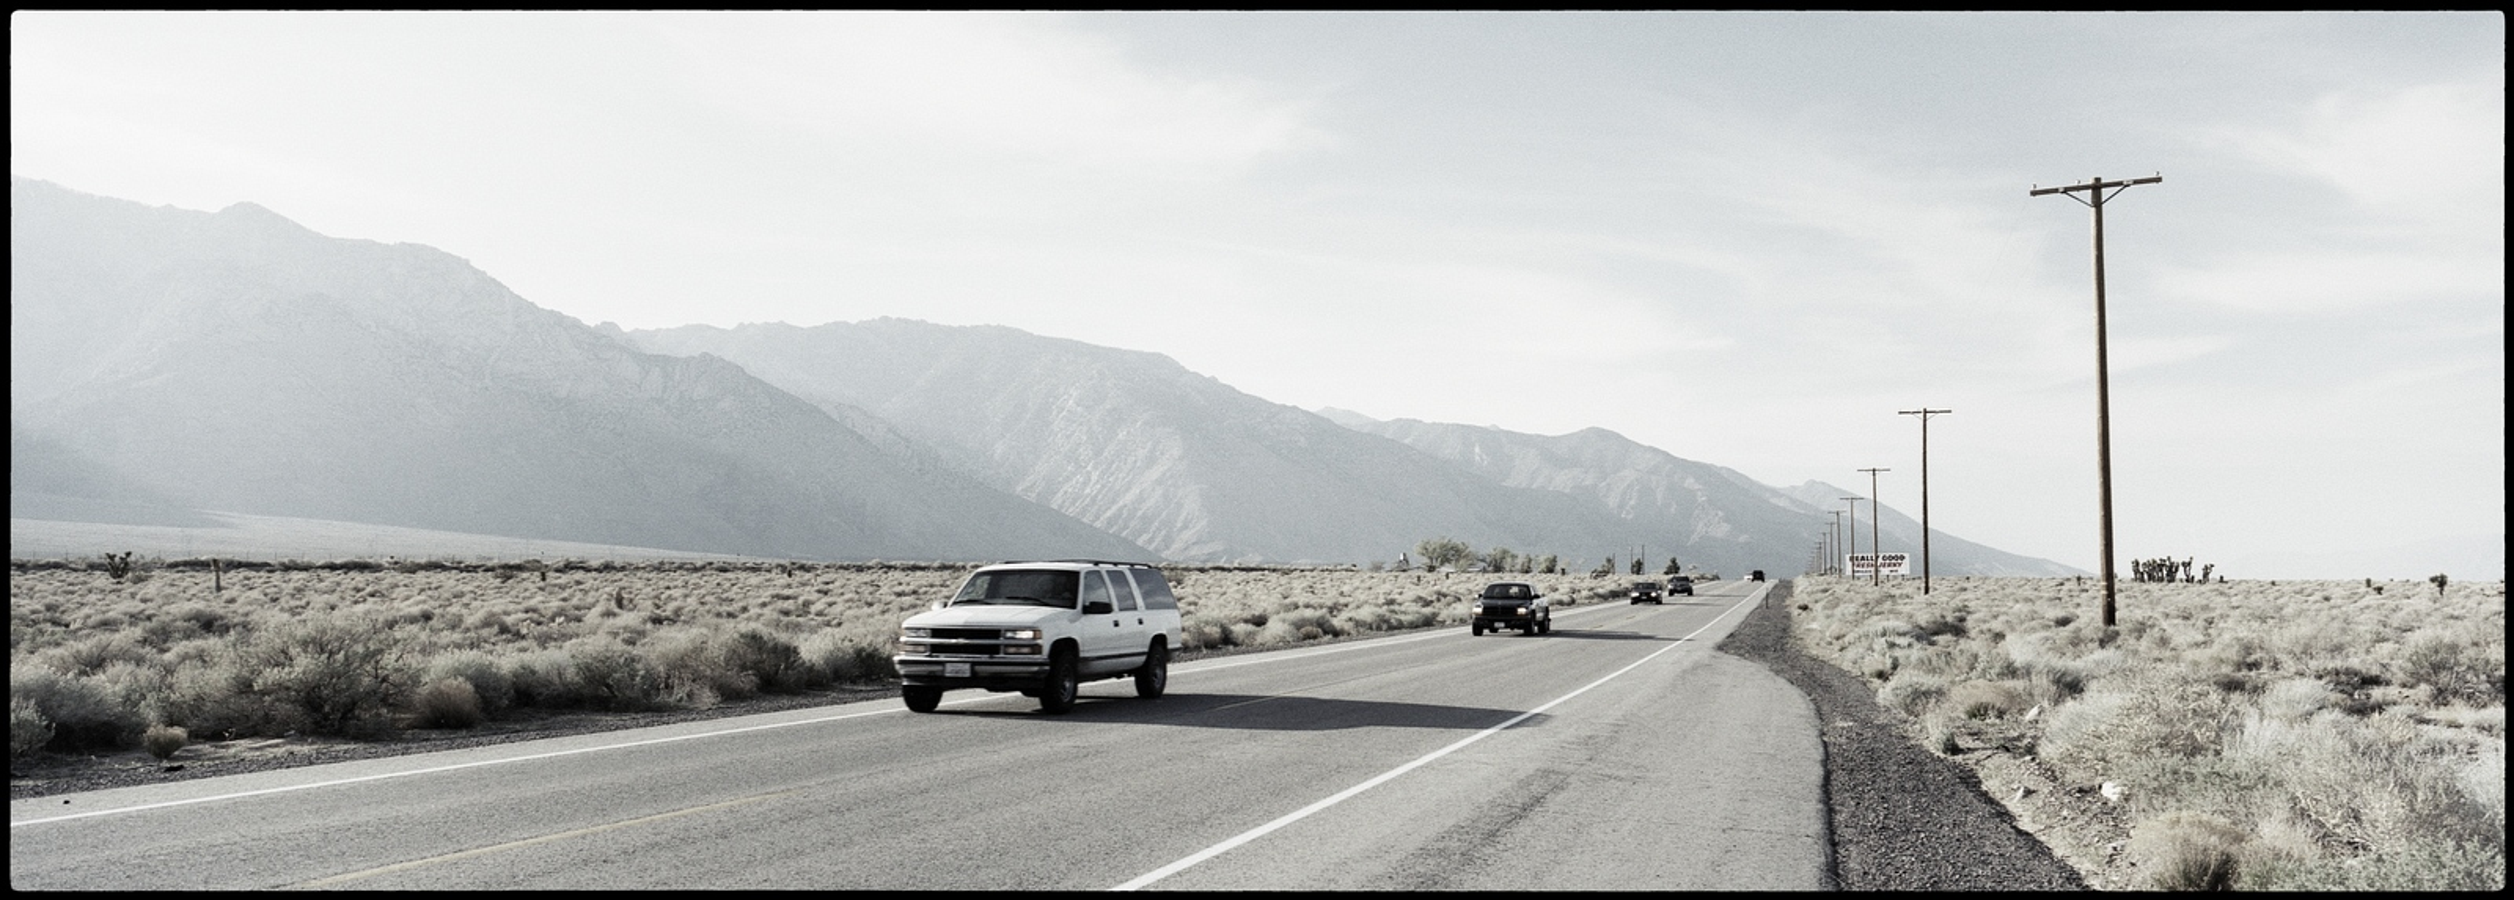 Mojaves Desert, CA, USA